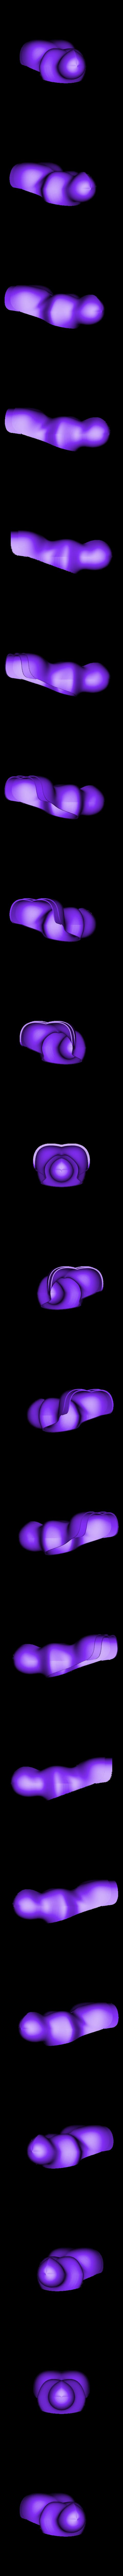 matriochka v3 a N4.stl Télécharger fichier STL gratuit WHITE MATRIOCHKA • Design pour impression 3D, DJER